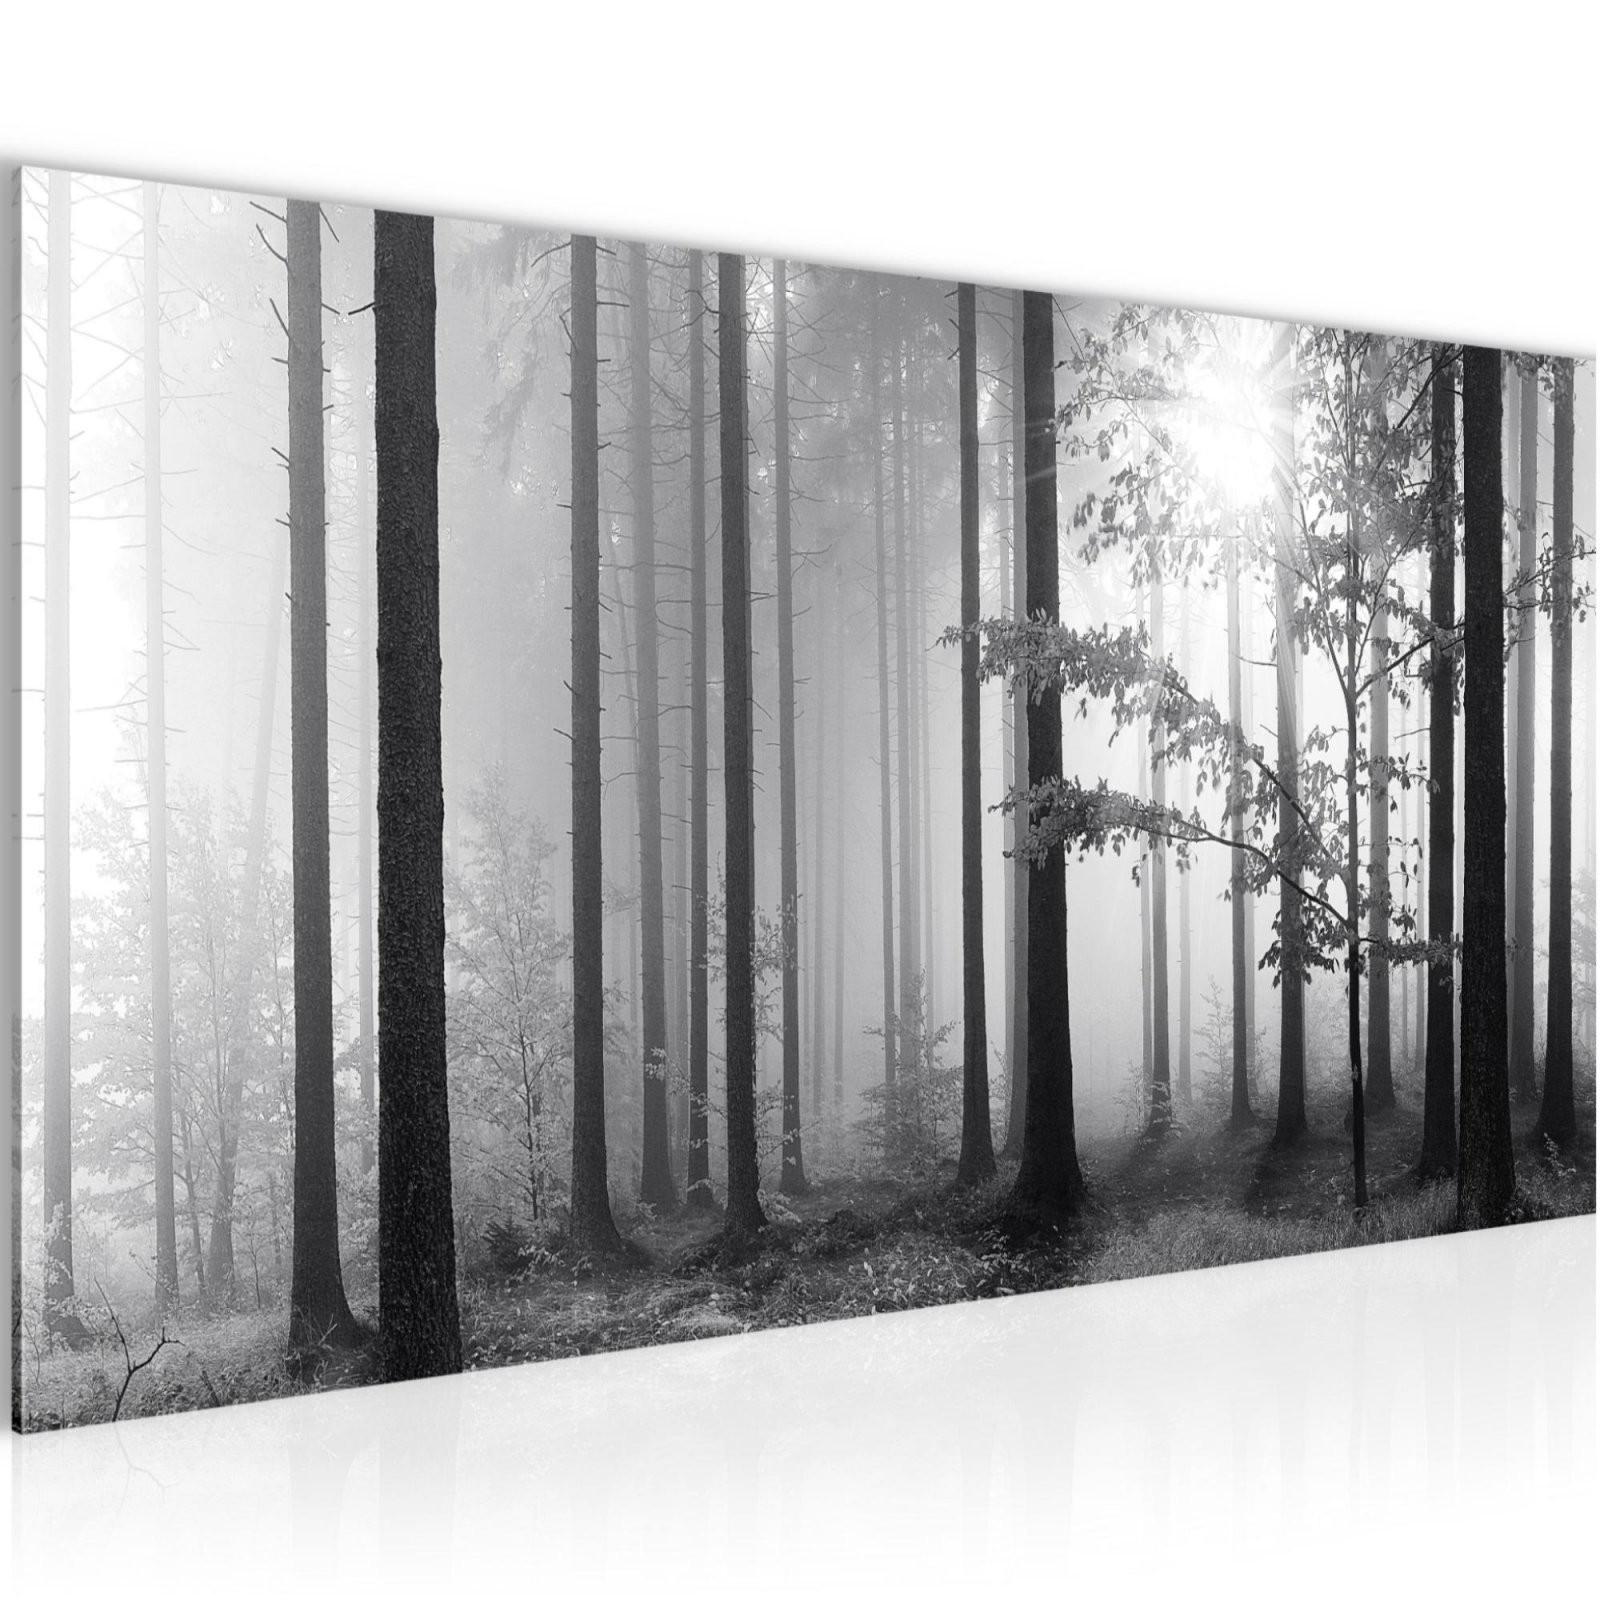 Wandbilder Wald Schwarz Weiß Vlies Leinwand Bild  Xxl Bilder von Leinwandbilder Schwarz Weiß Xxl Bild